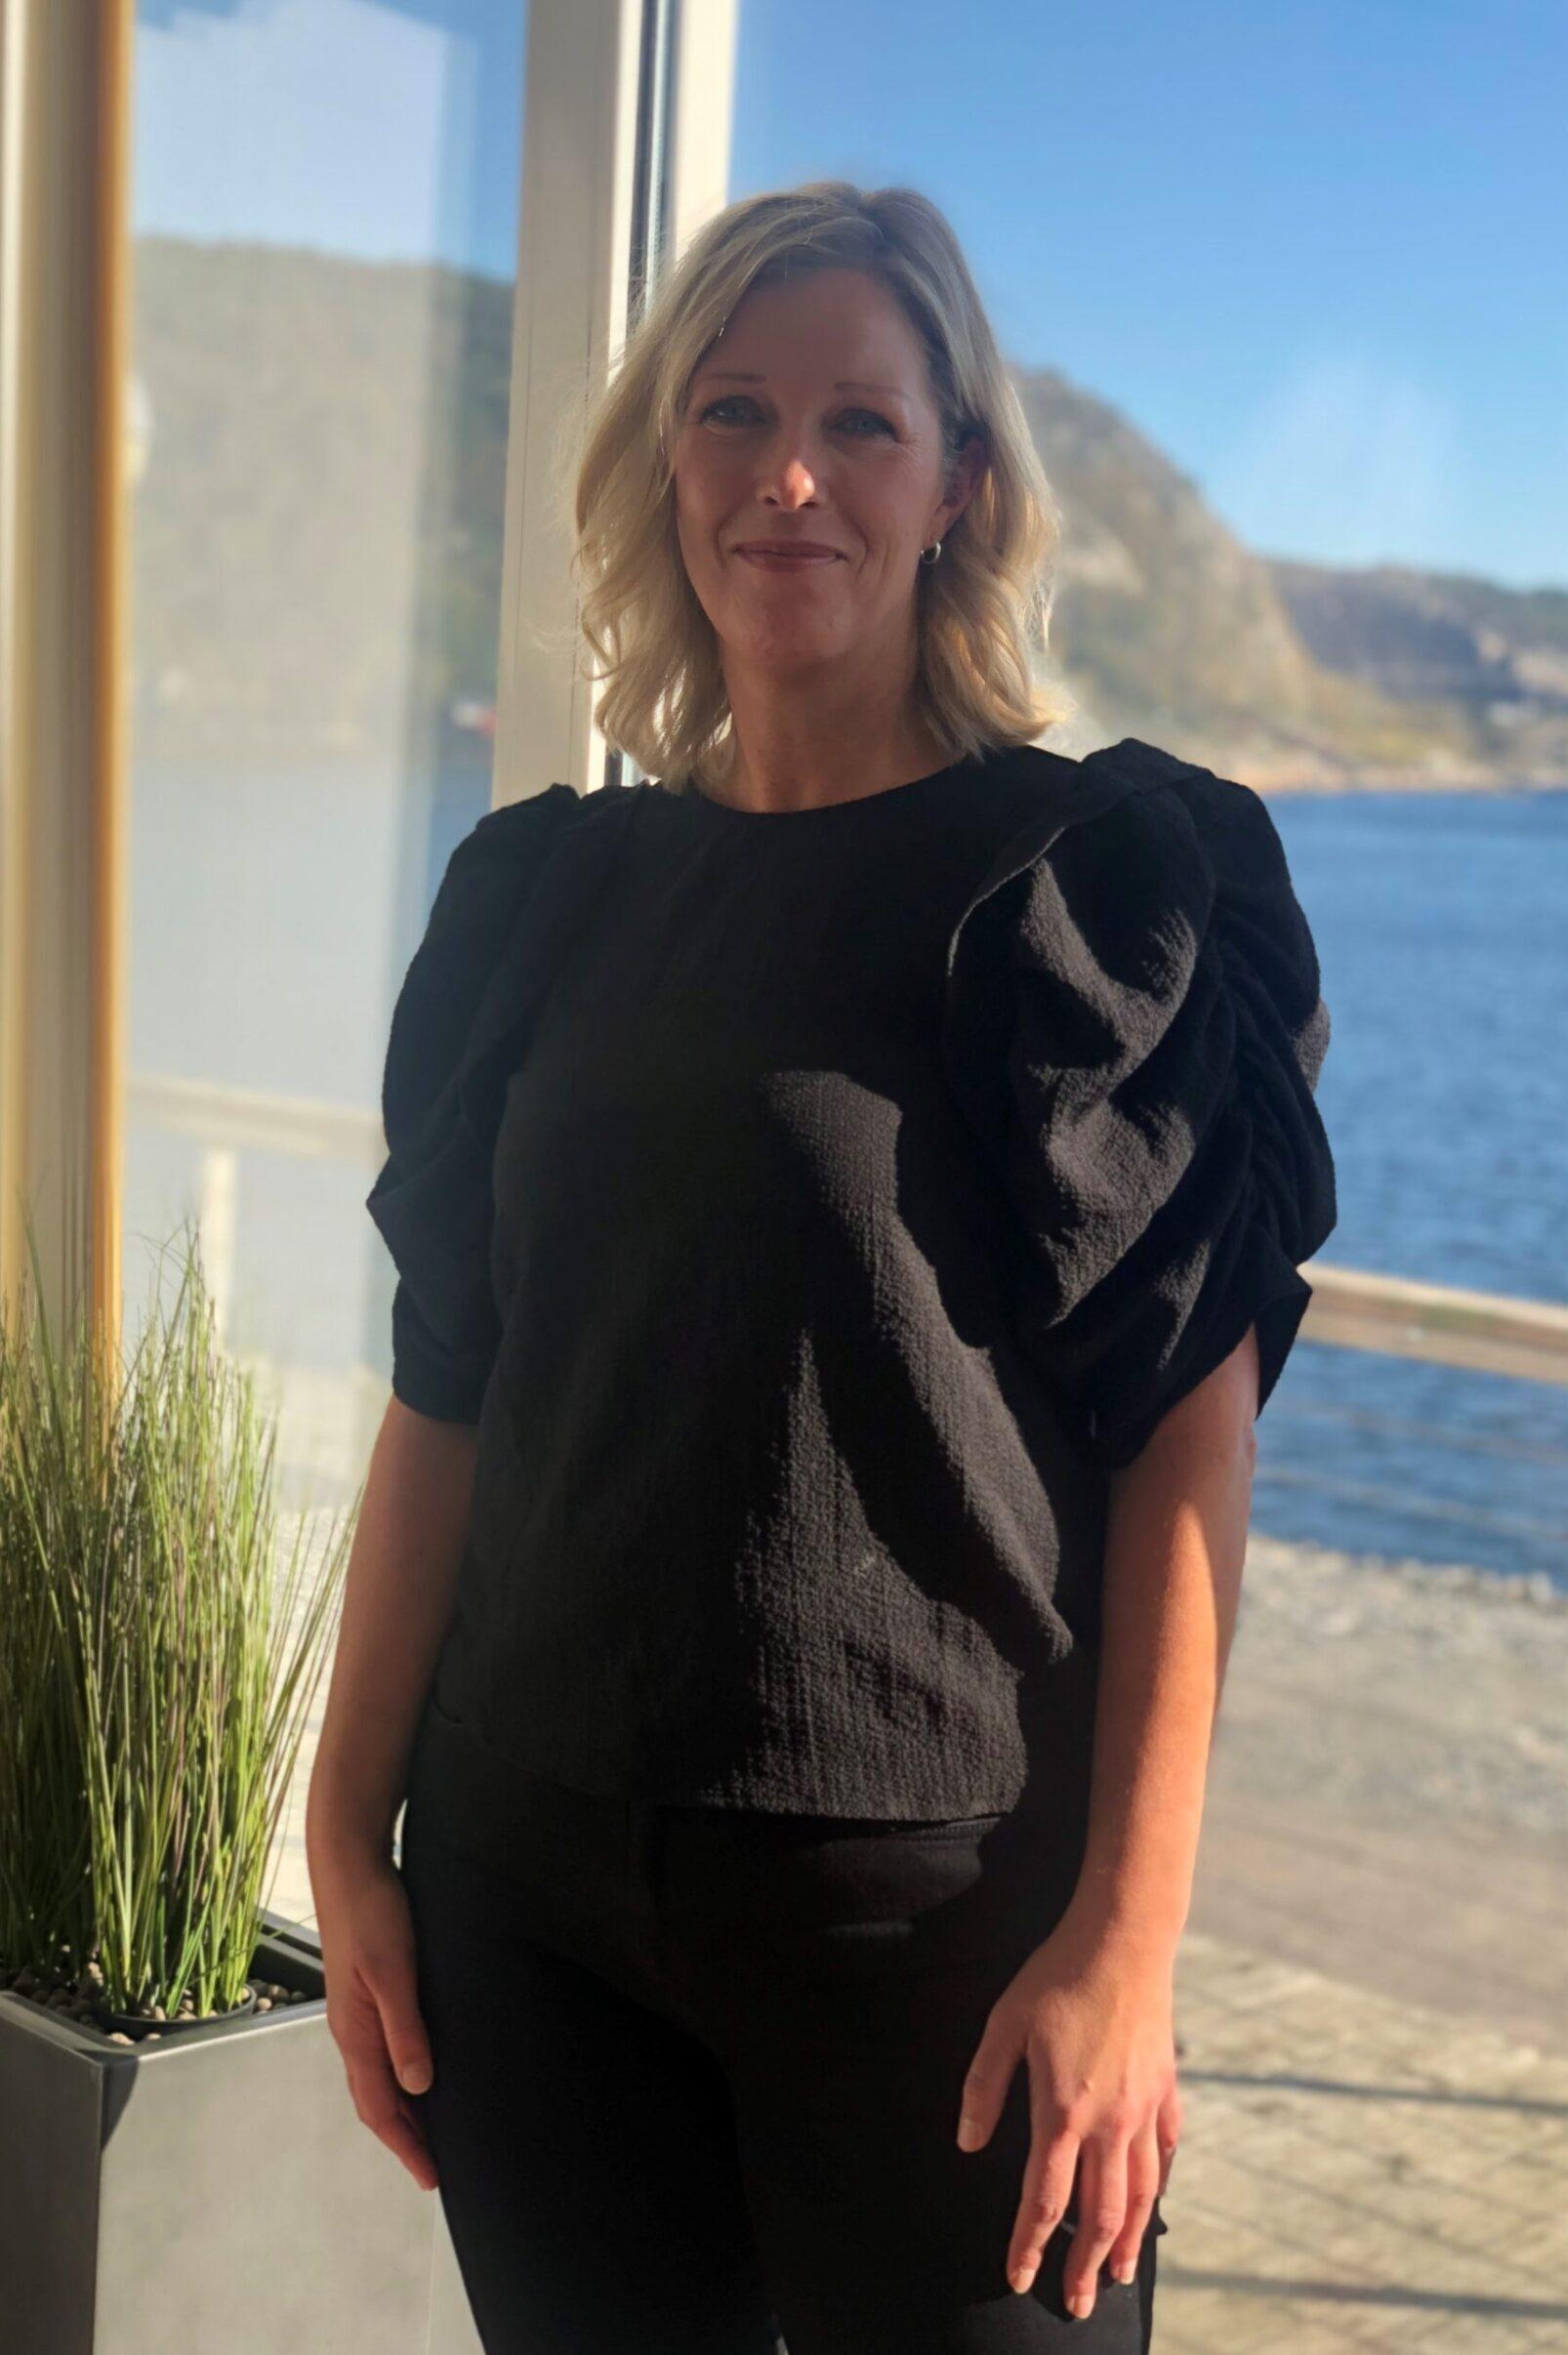 Merethe Thunberg-Christensen